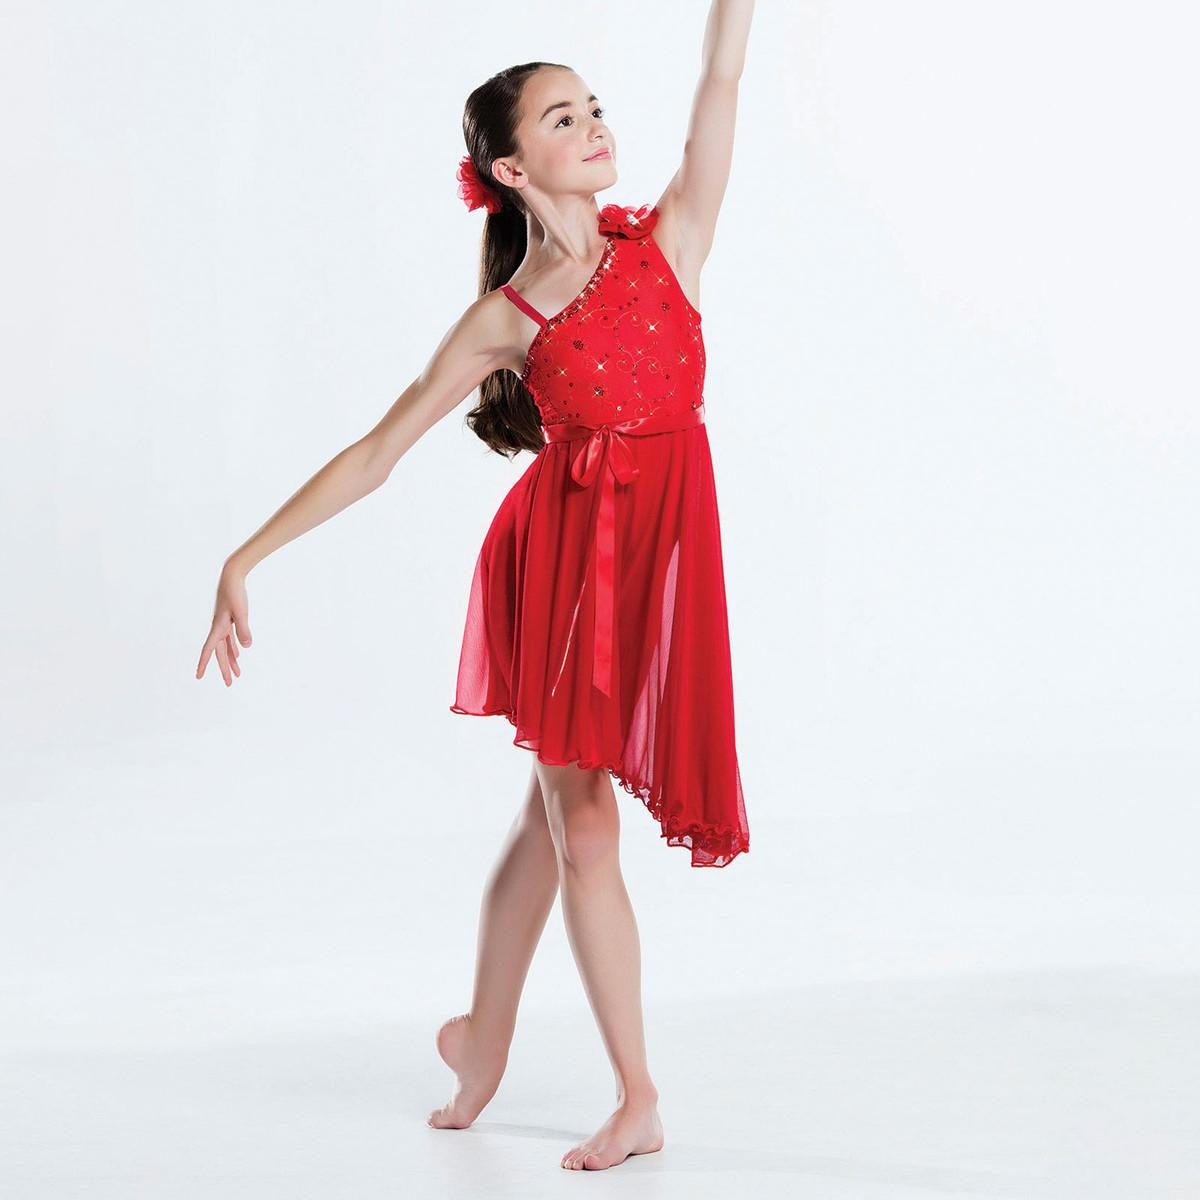 Where Are You Christmas Choreography